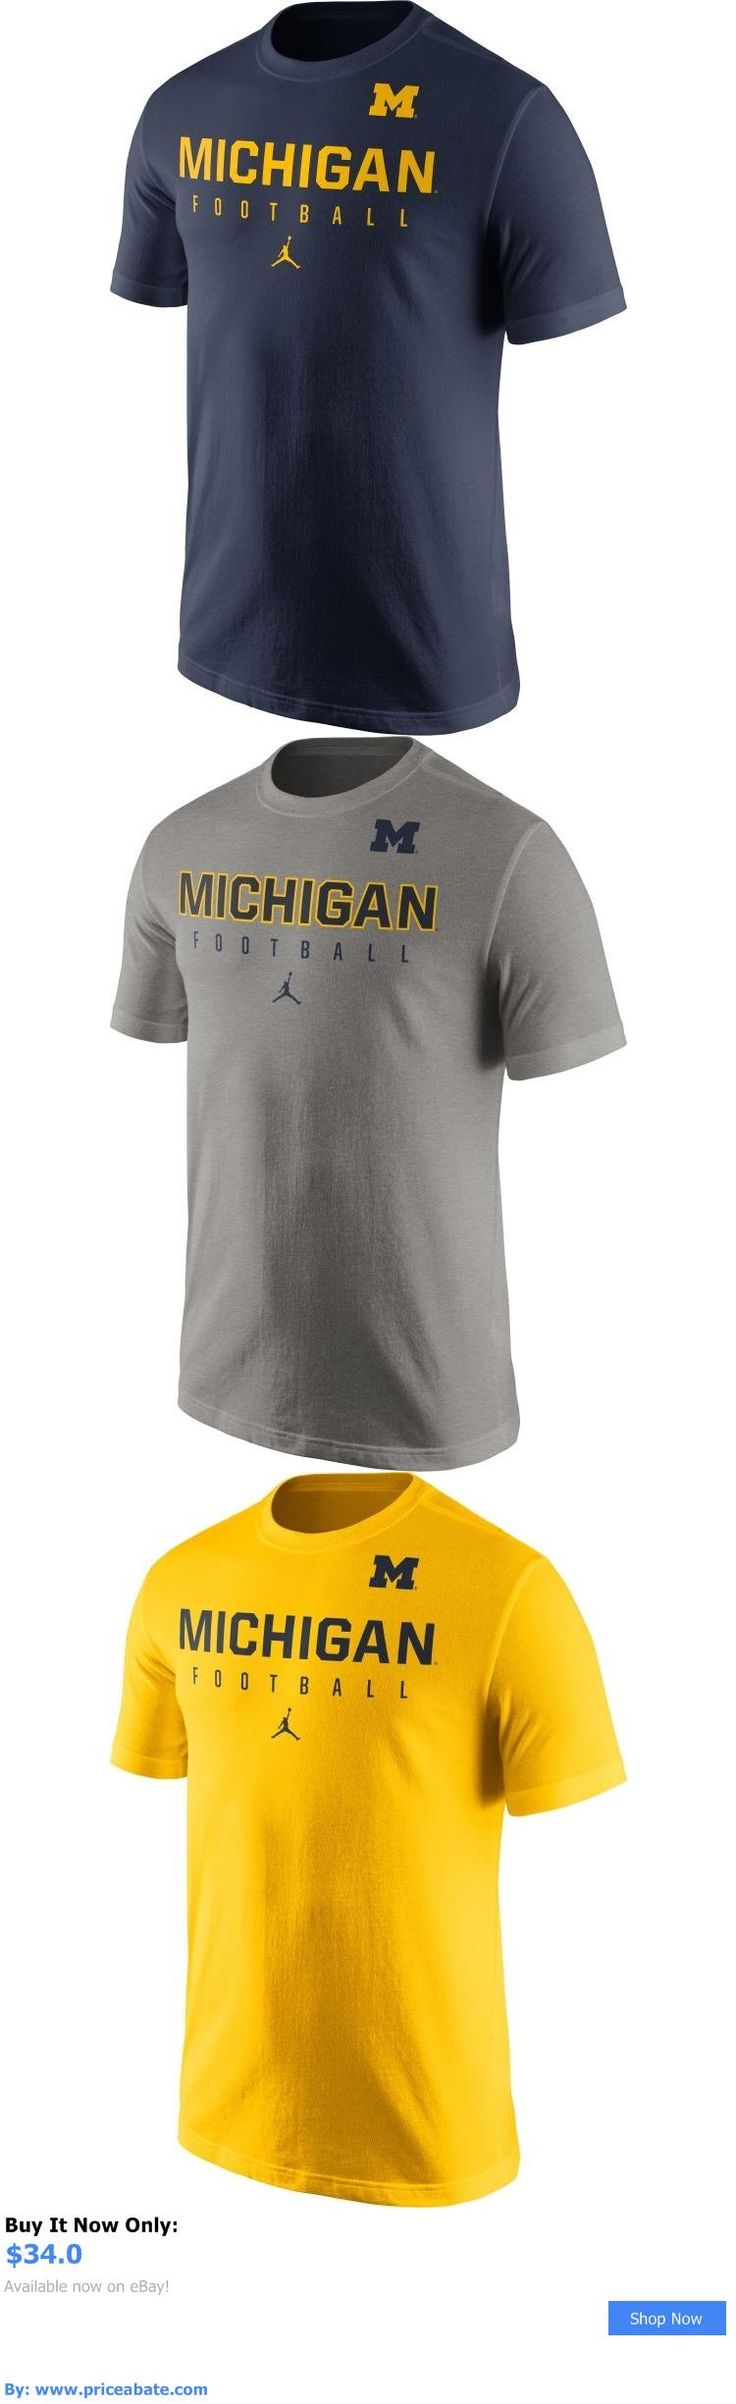 Sports Memorabilia: New Jordan Mens Michigan Wolverines Blue Football Practice T-Shirt BUY IT NOW ONLY: $34.0 #priceabateSportsMemorabilia OR #priceabate